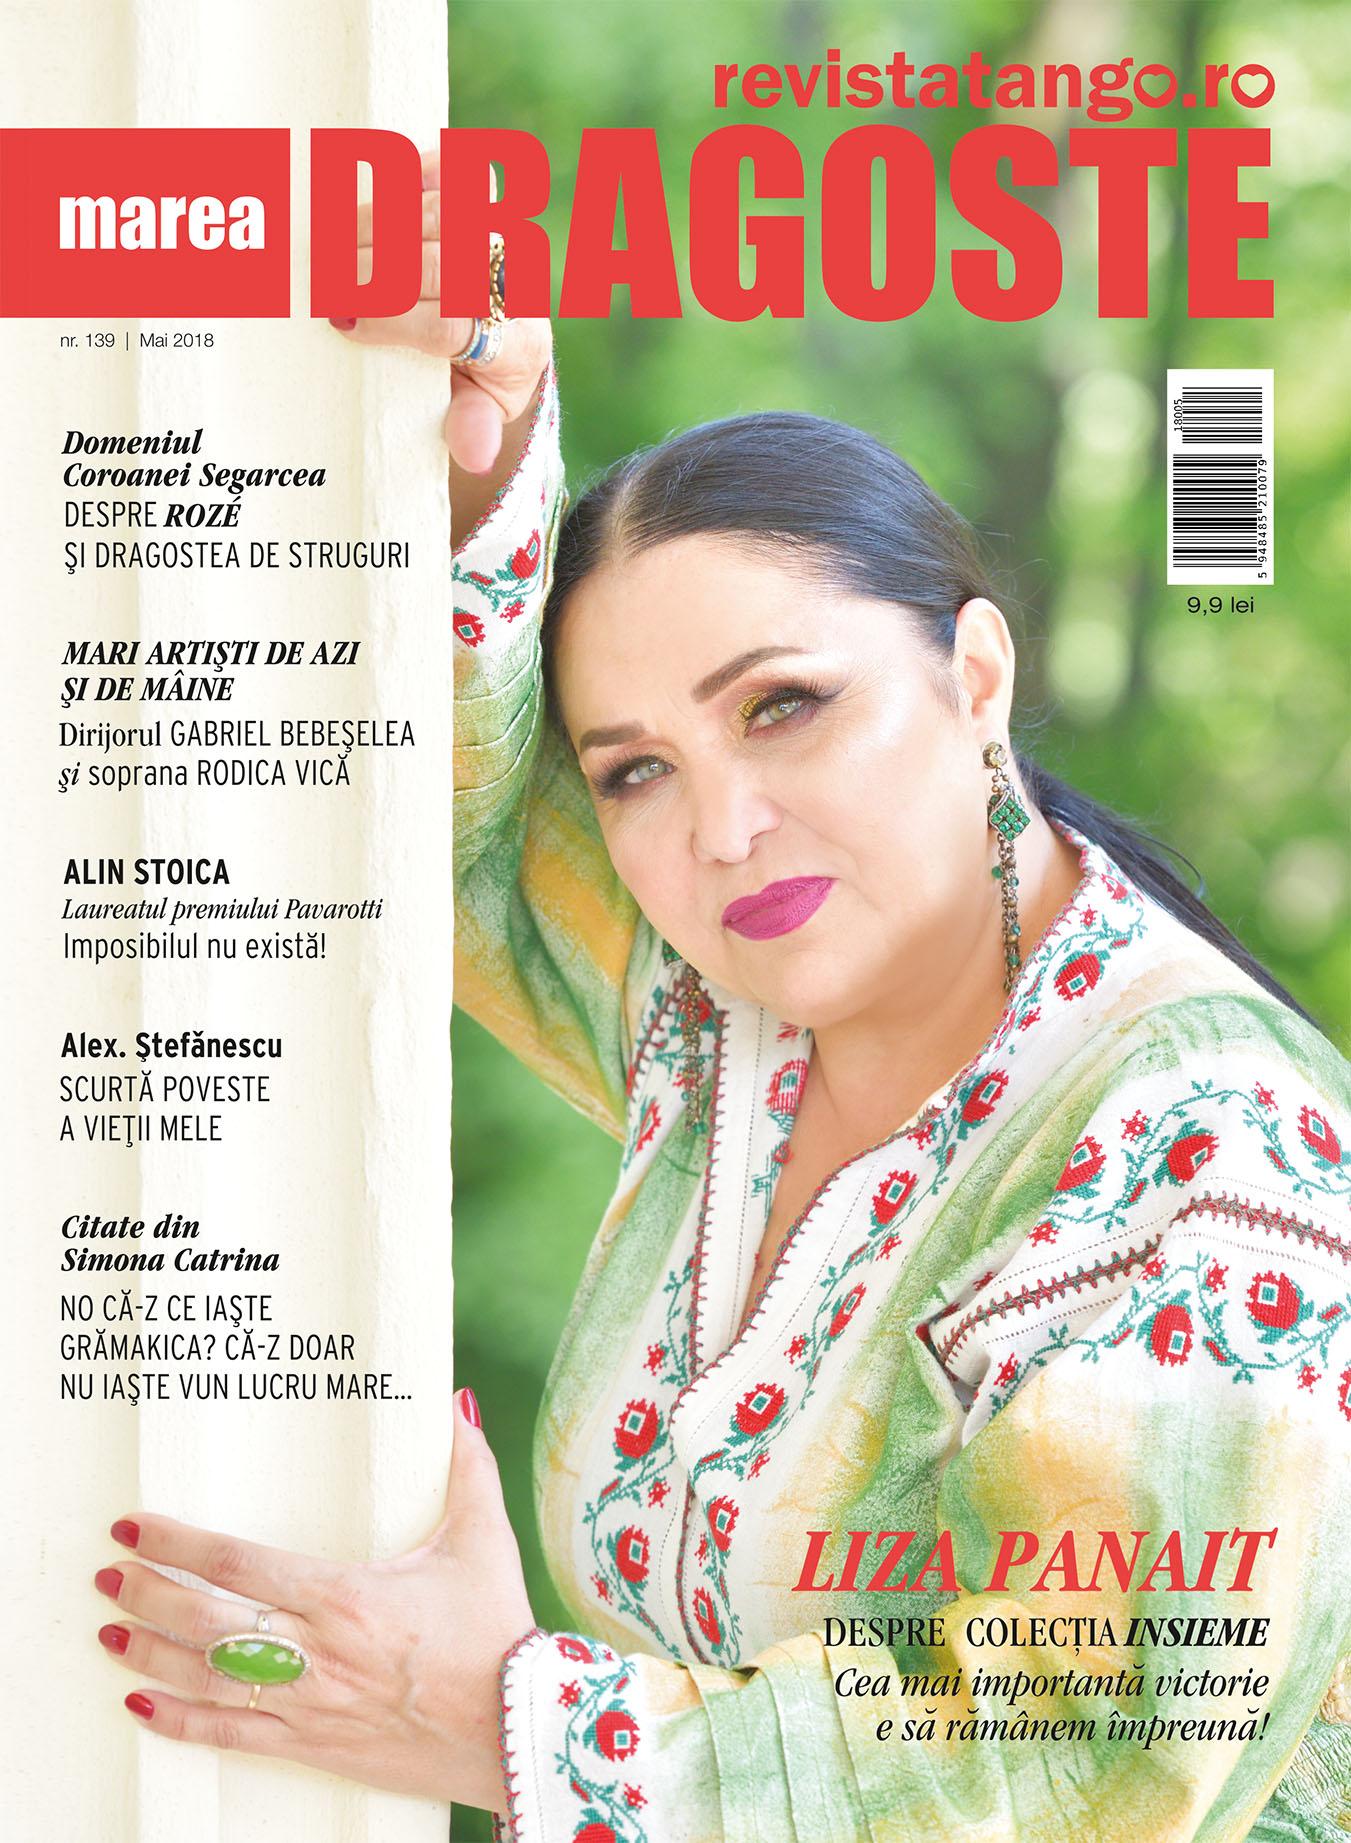 Liza Panait pe coperta Marea Dragoste-revistatango.ro, nr. 139, mai 2018